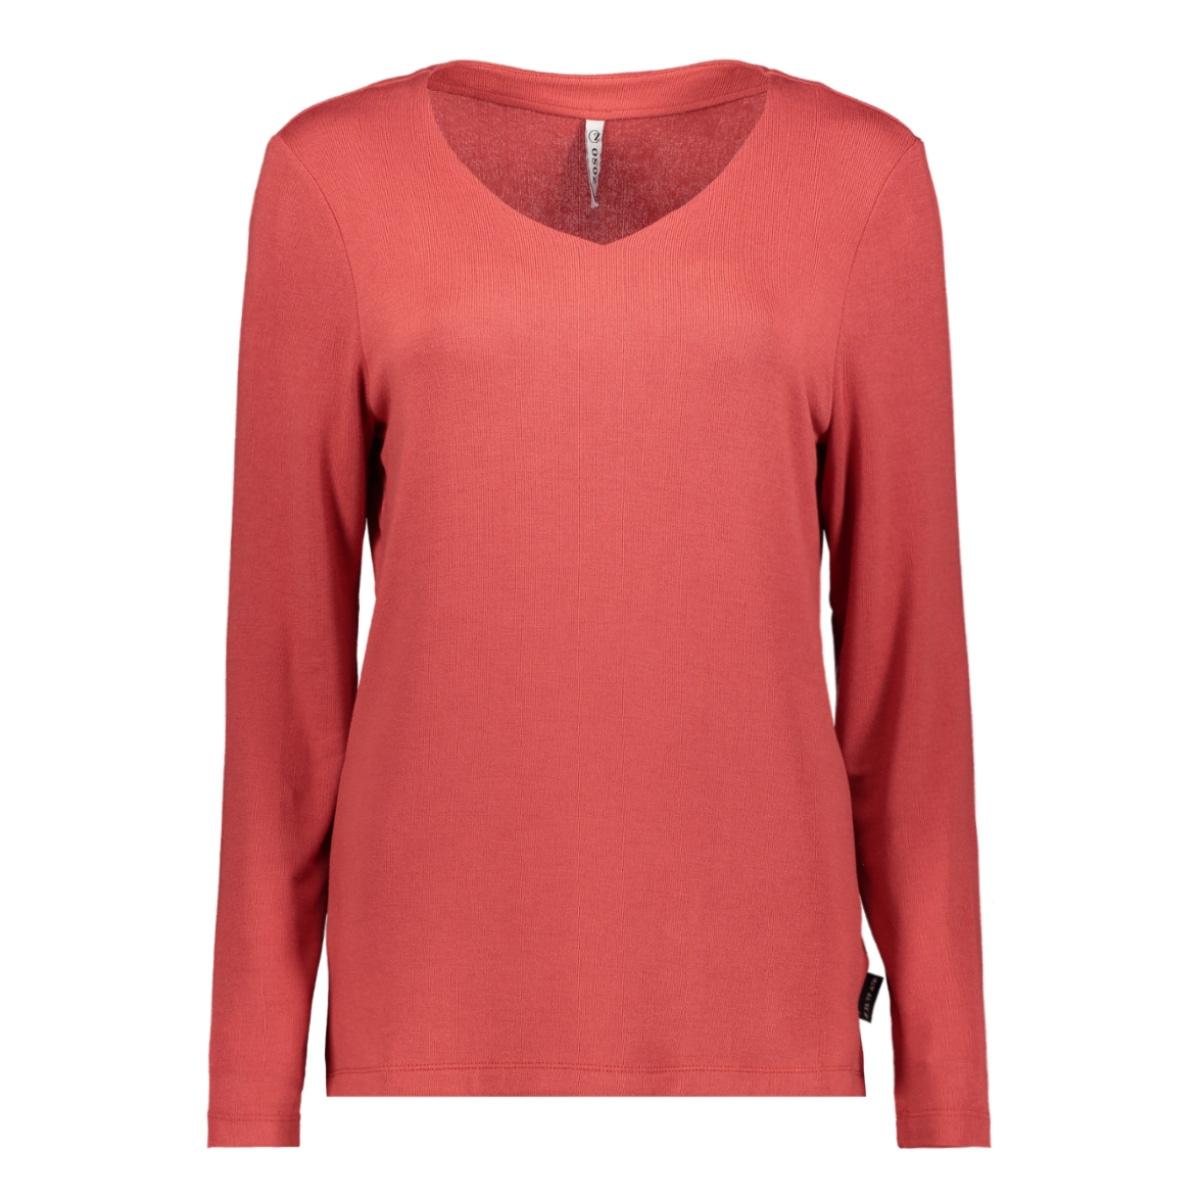 viv luxury basic shirt 201 zoso trui 0072 desert red